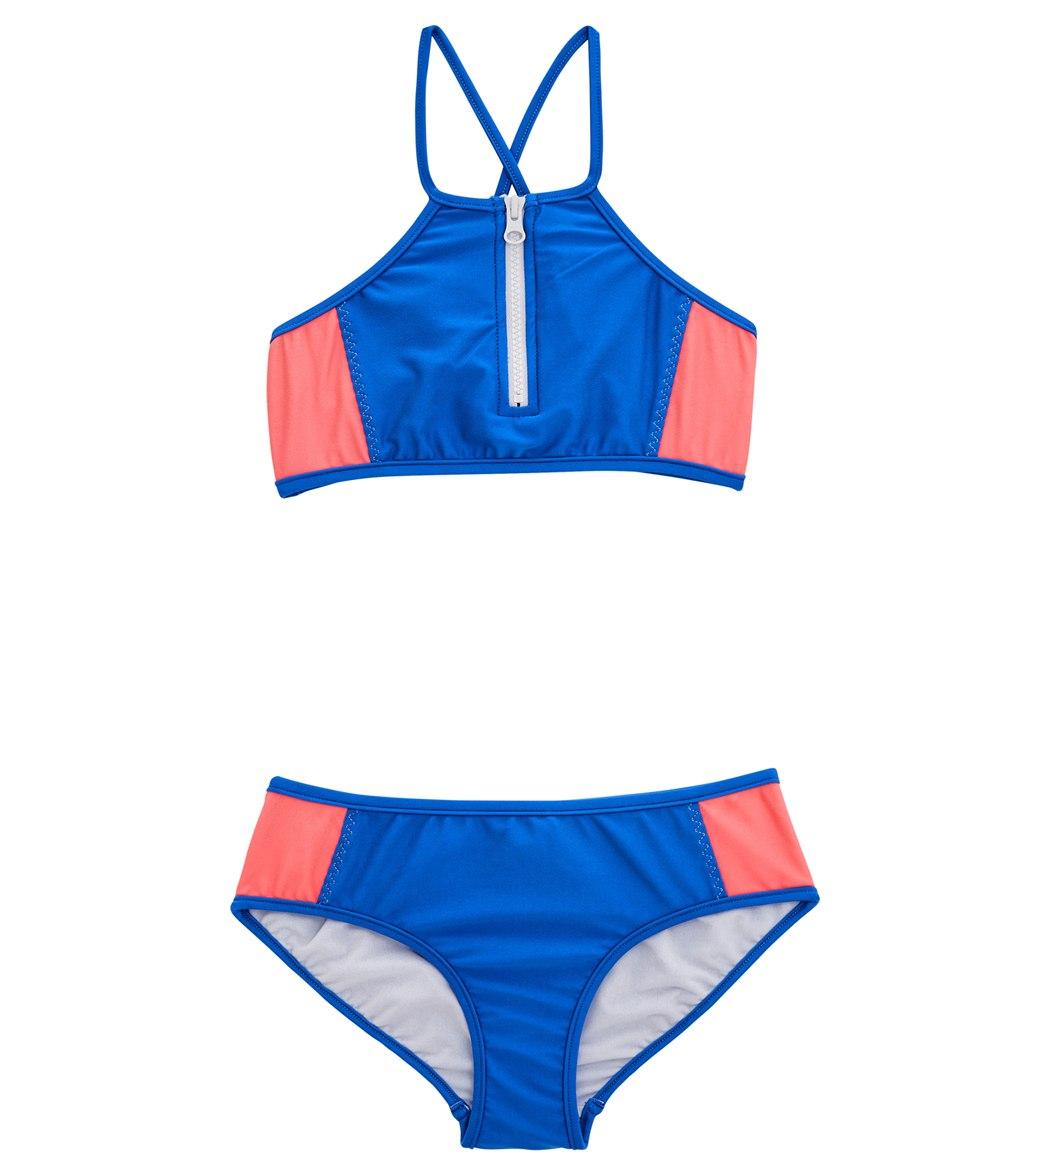 01c412eddccc8 Seafolly Girls' Summer Essentials Colour Blocked Tankini Set (Big Kid) at  SwimOutlet.com